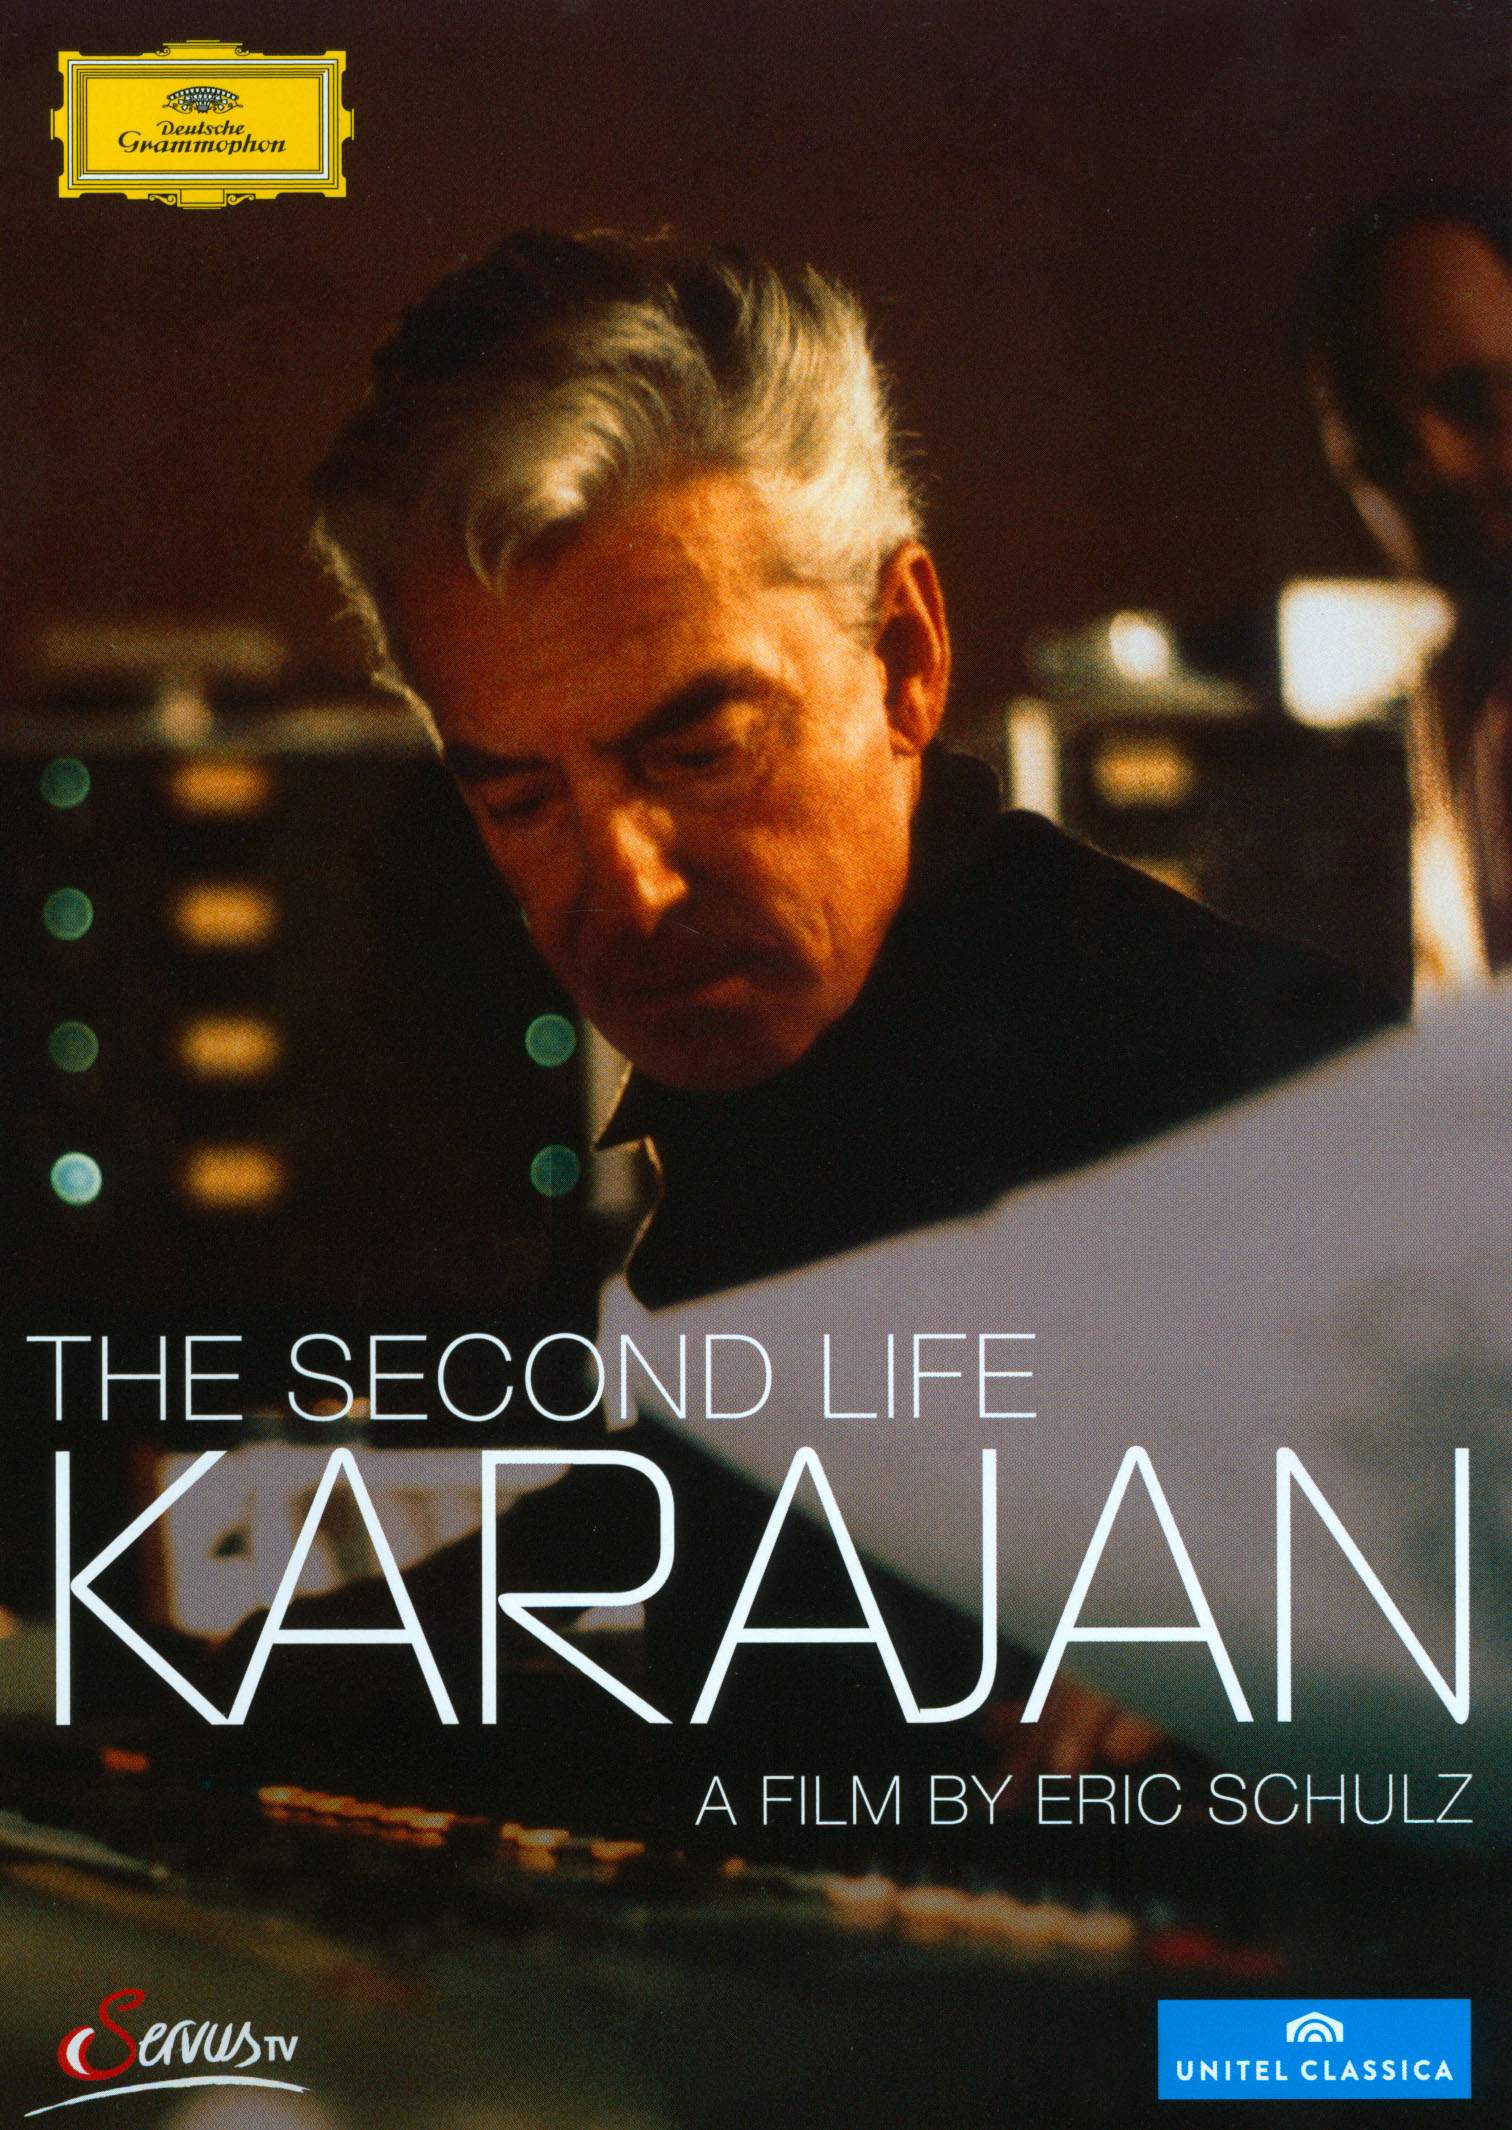 Karajan: The Second Life